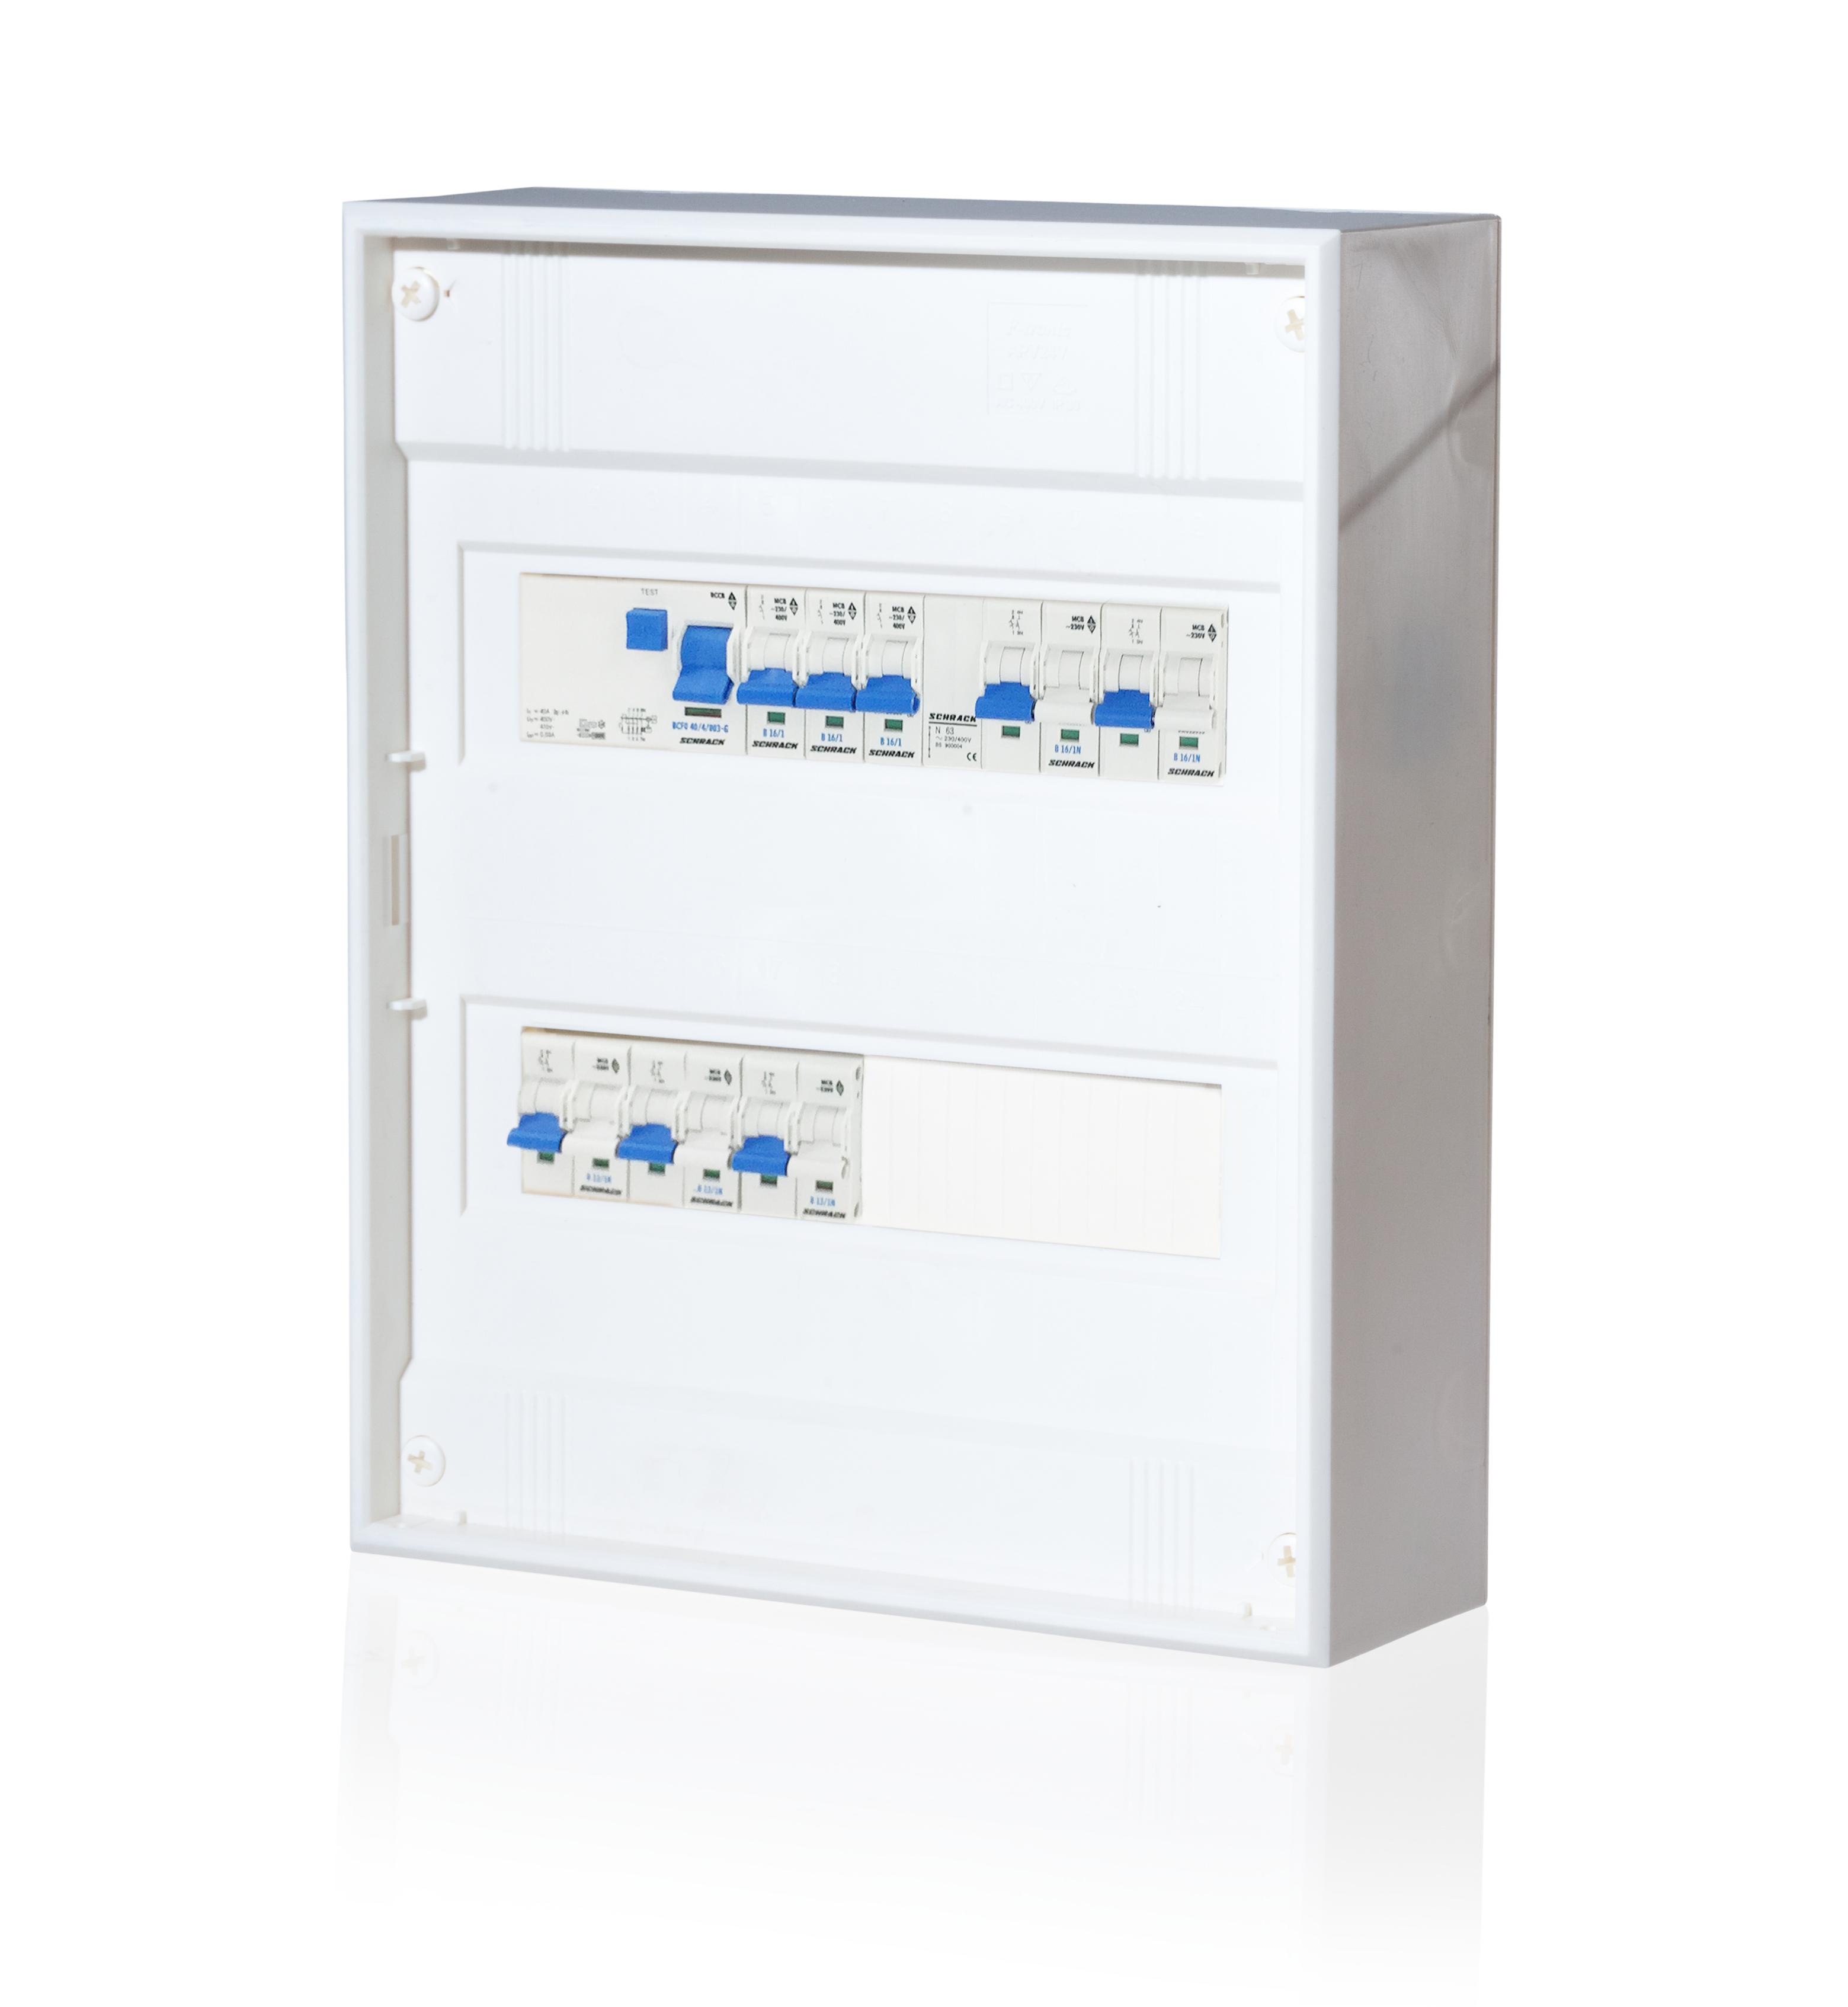 1 Stk AP-Wohnungsverteiler 2-reihig mit FI G, Typ A BKAP400GA-